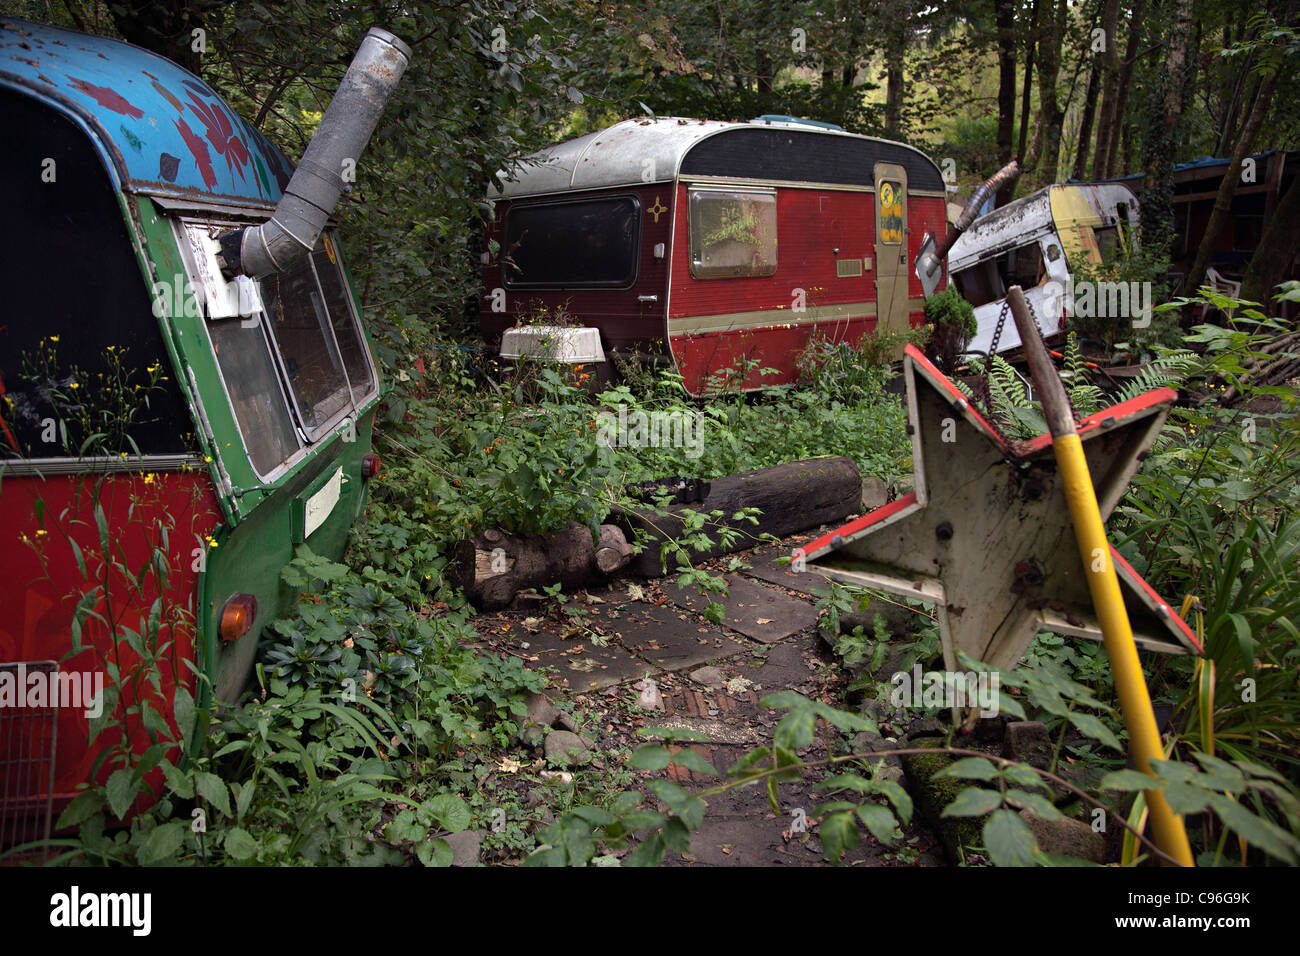 caravans at faslane peace camp in scotland - Stock Image